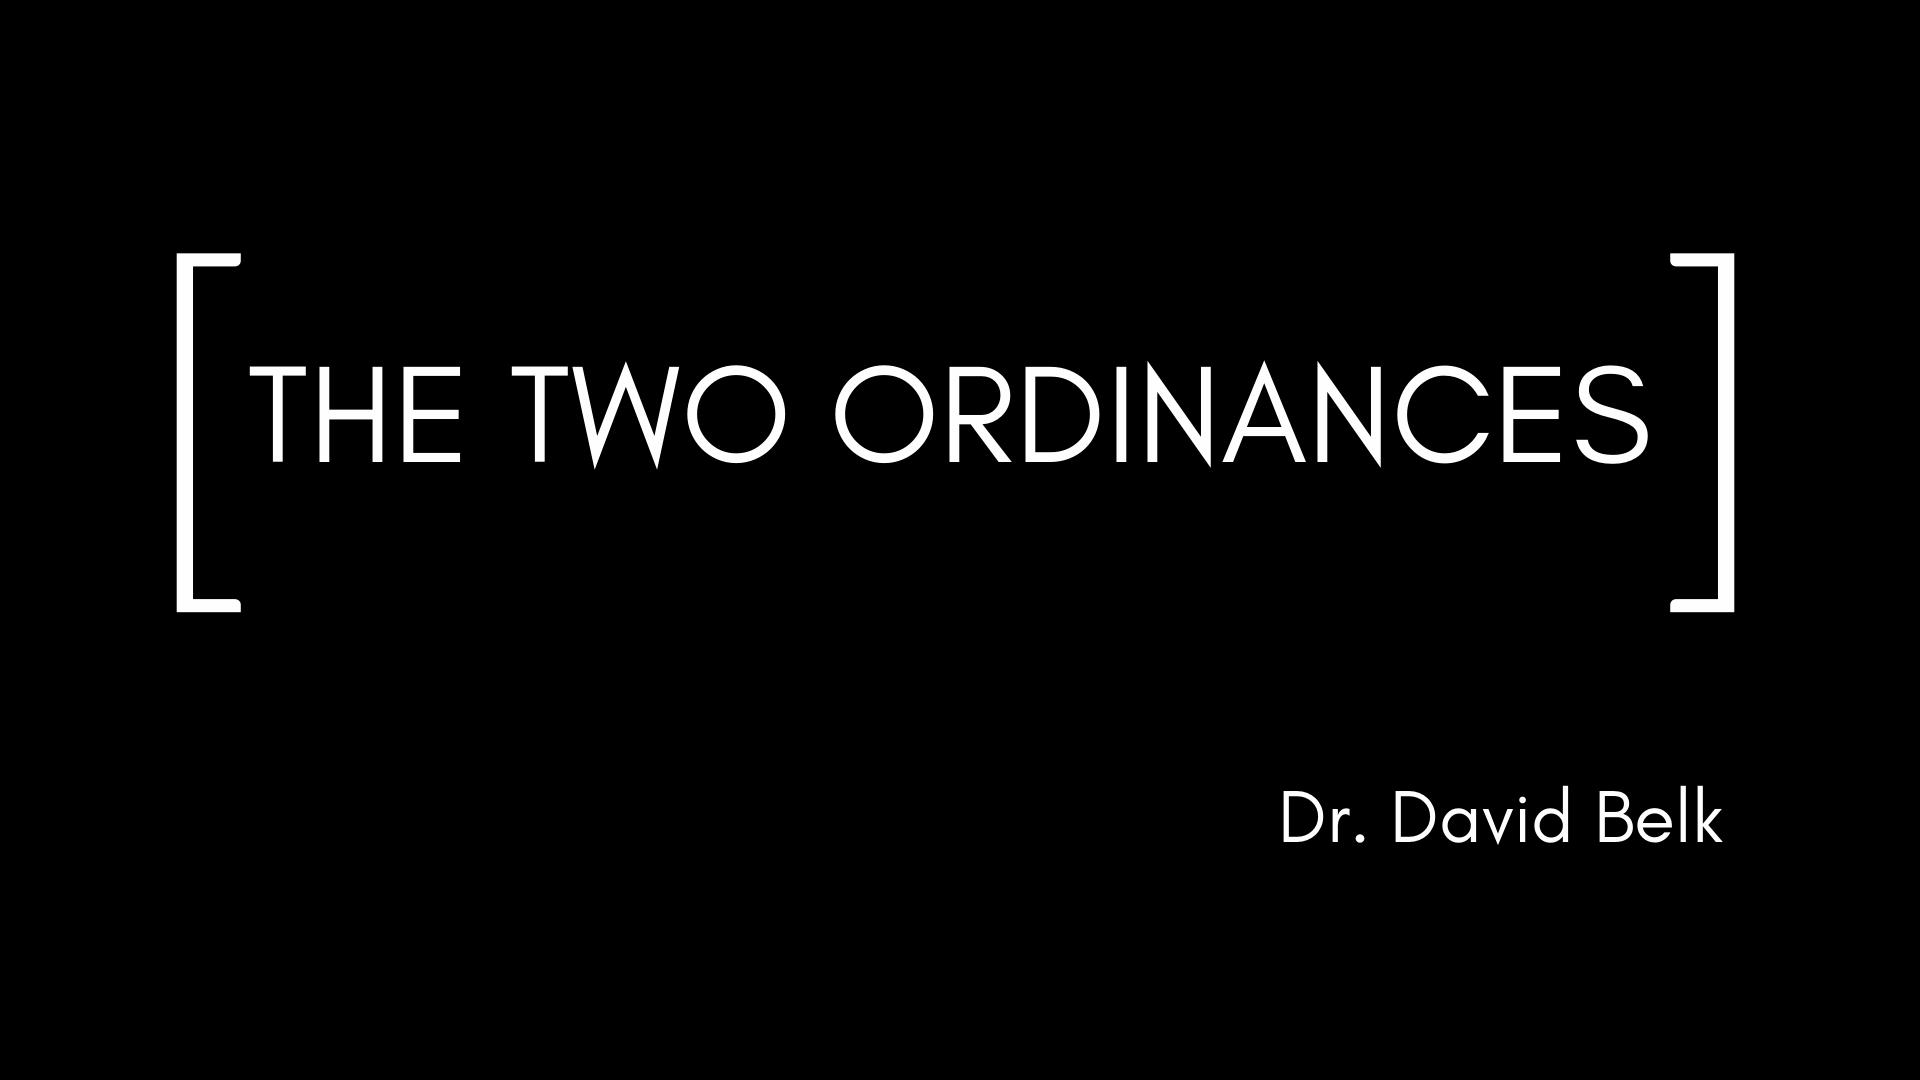 The Two Ordinances